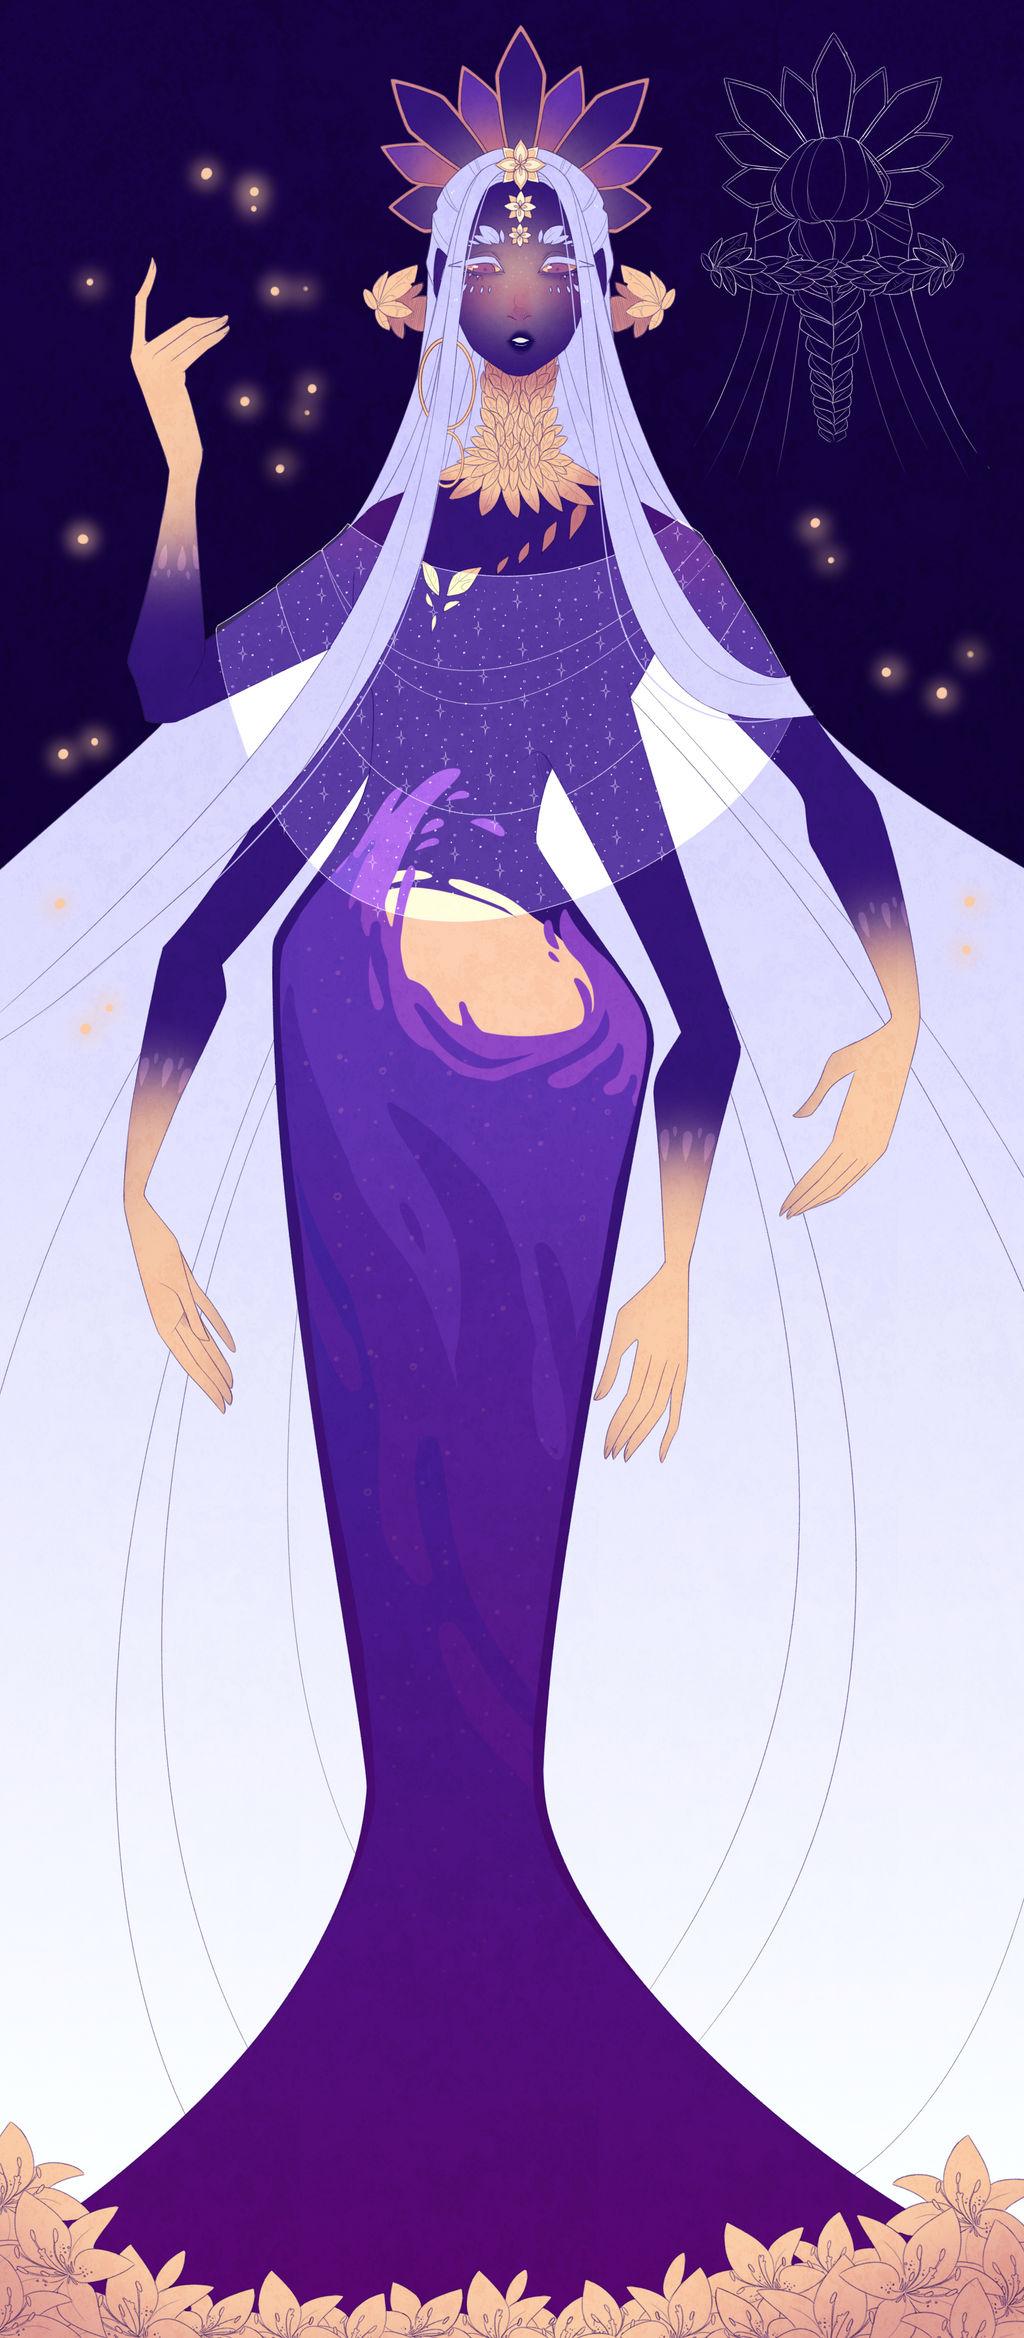 custom design : Goddess by Looji